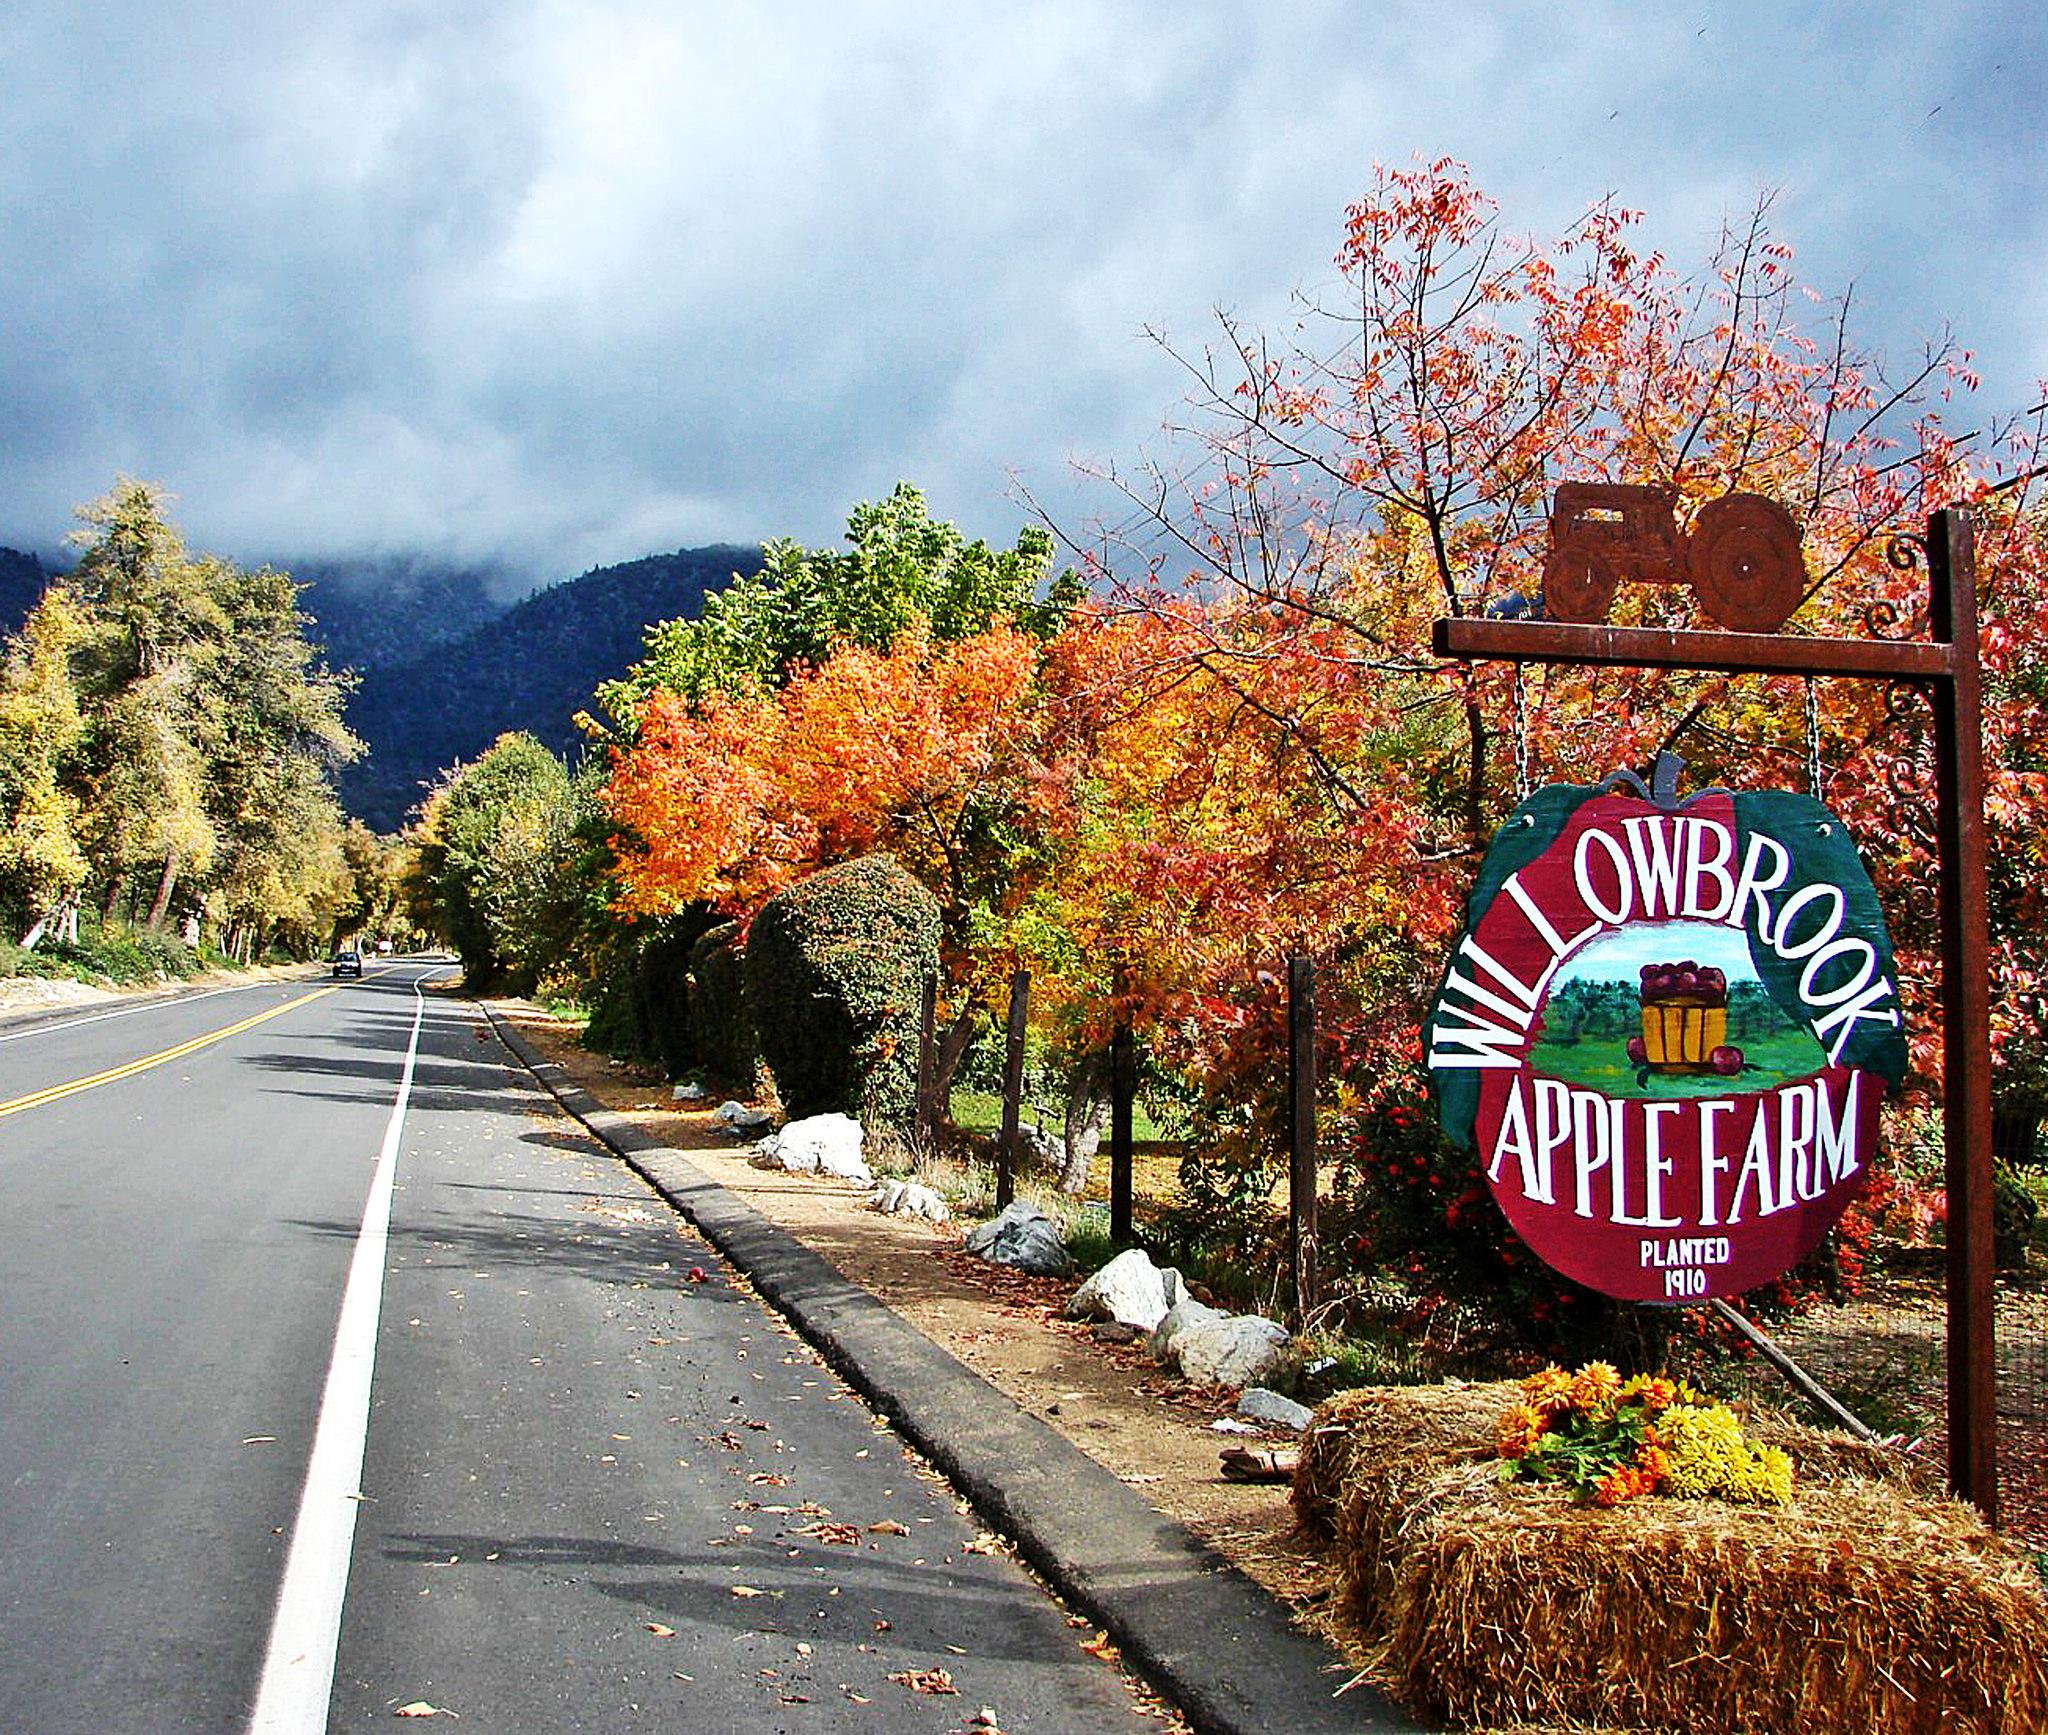 Image of Willowbrook Apple Farm entrance